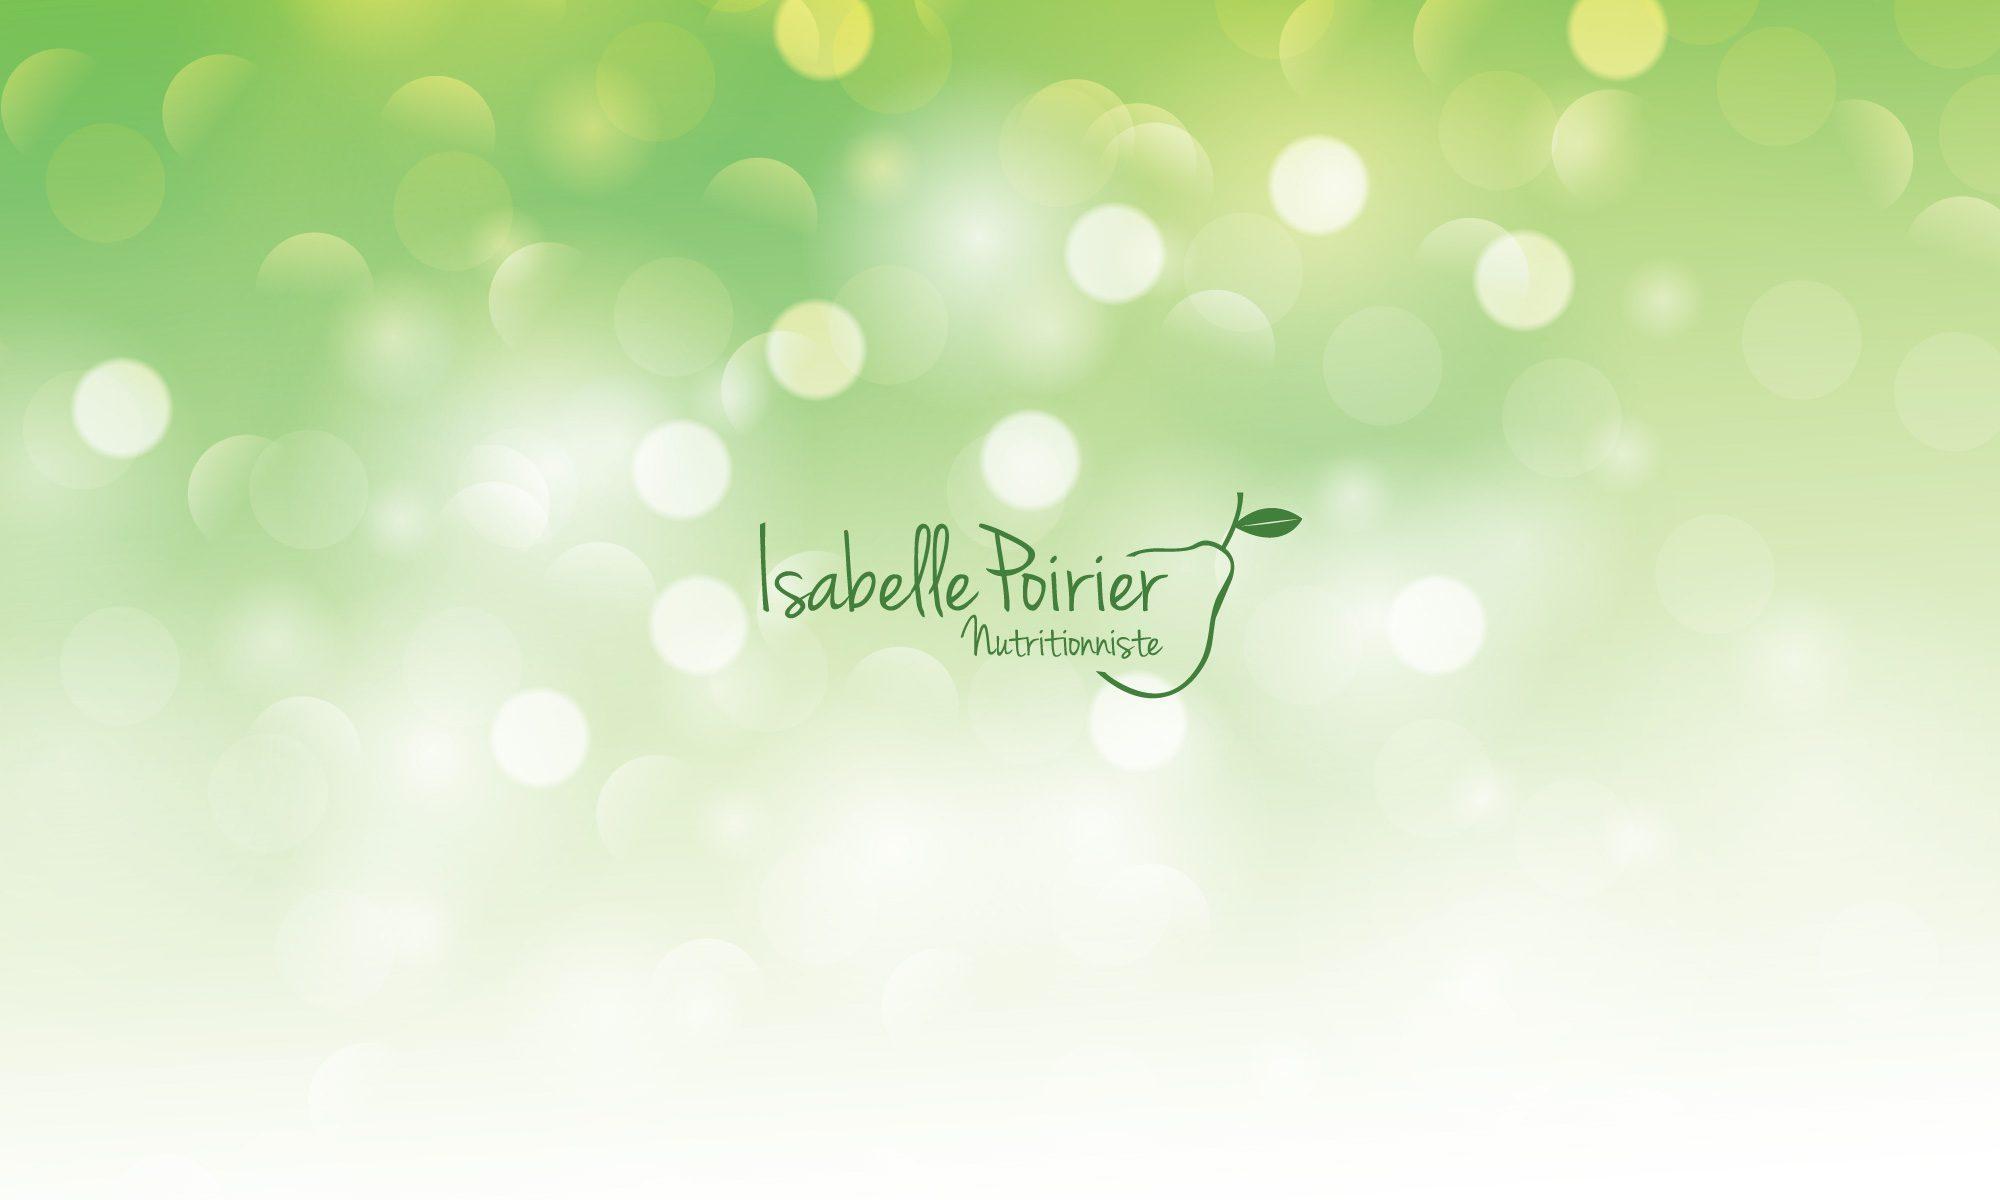 Isabelle Poirier Nutritionniste